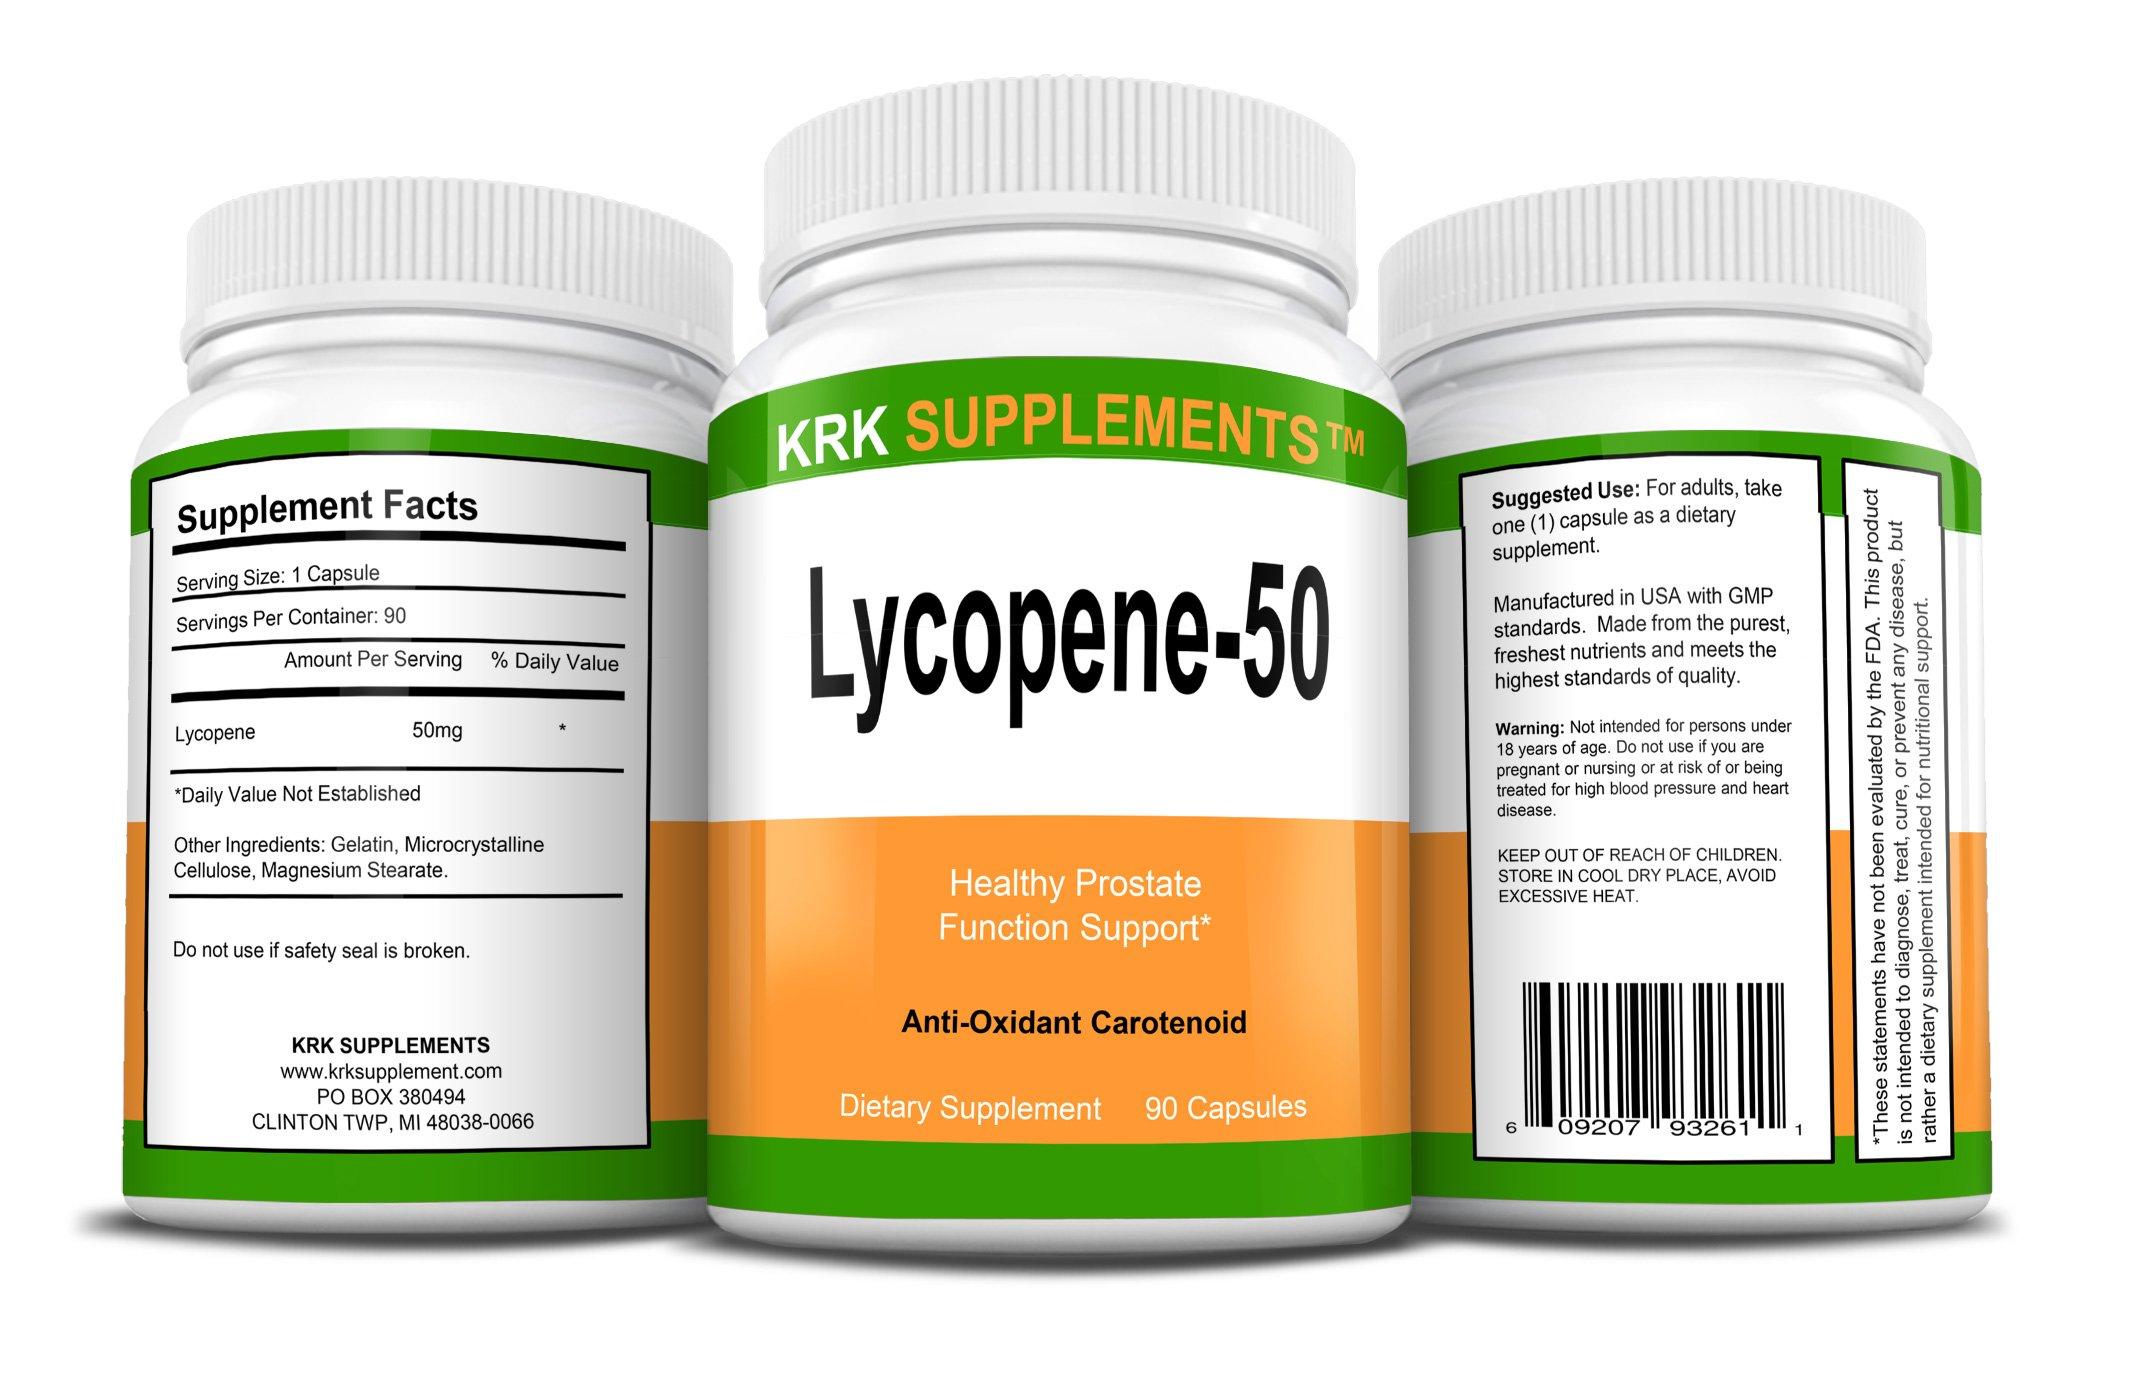 2 Bottles Lycopene 50mg 180 Total Capsules KRK Supplements by KRK SUPPLEMENTS (Image #2)